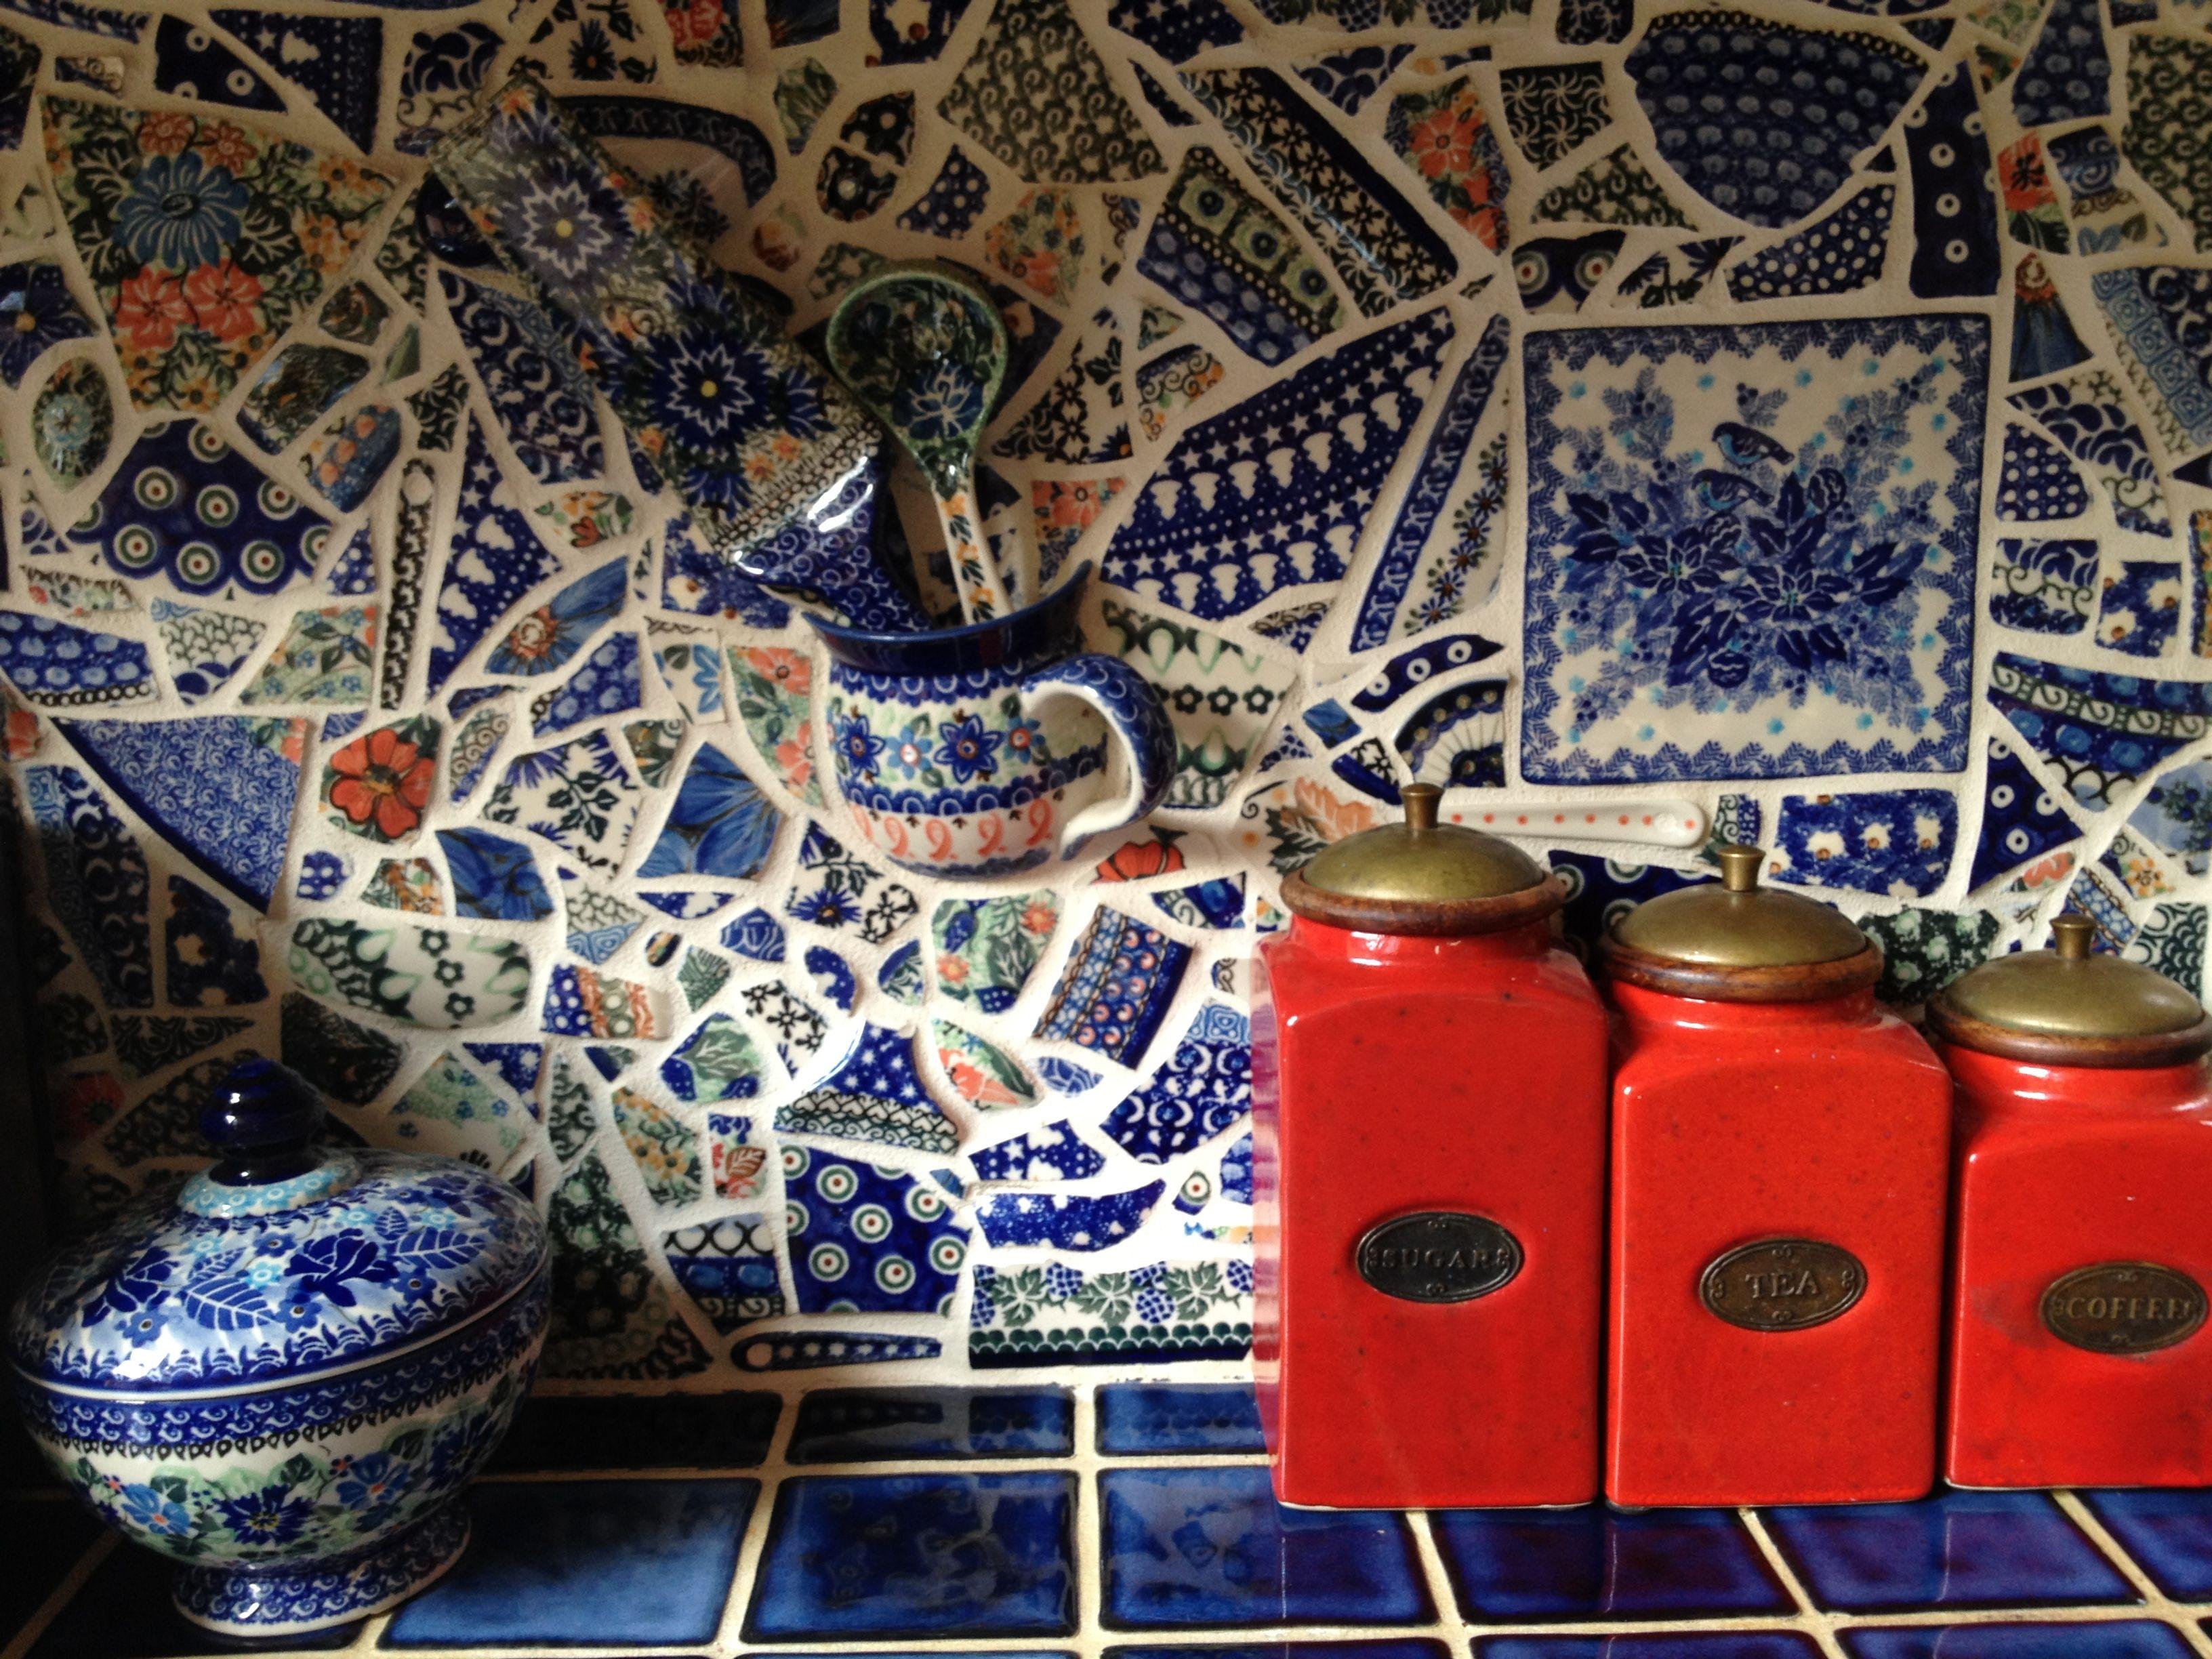 My mother took broken polish pottery and turned it into a mosaic my mother took broken polish pottery and turned it into a mosaic on her kitchen walls dailygadgetfo Choice Image